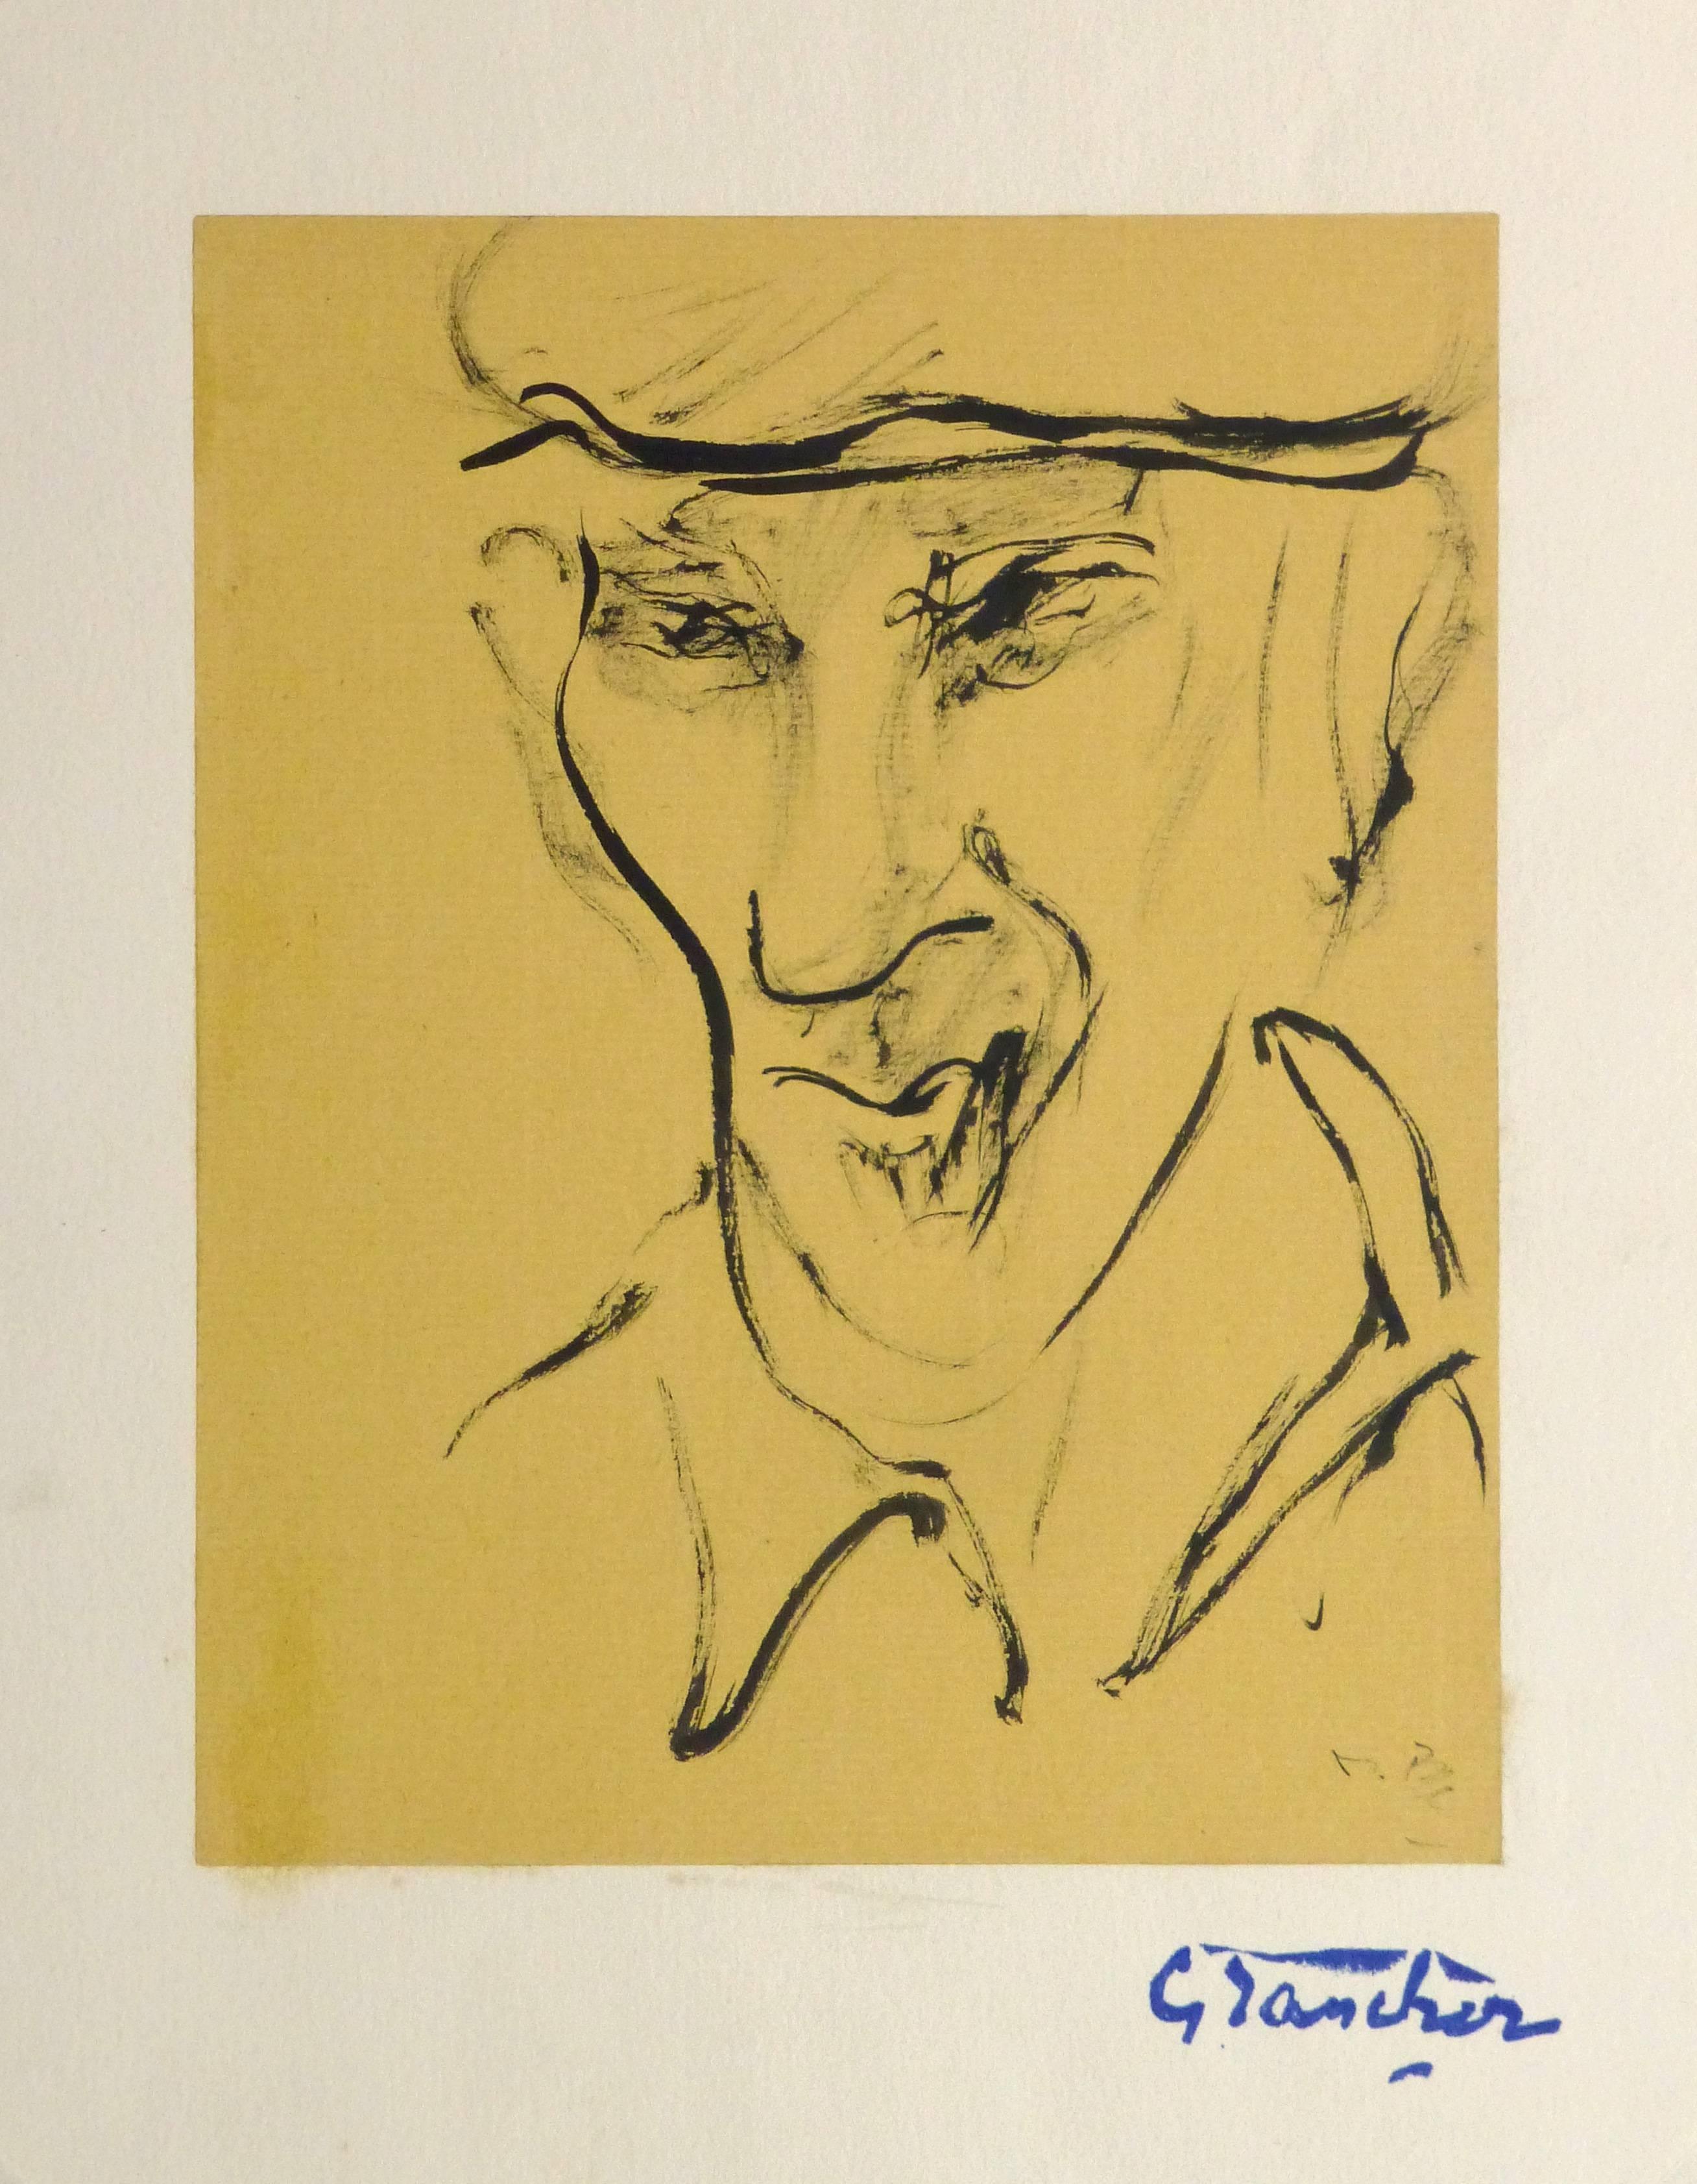 French Ink Portrait - The Farmhand